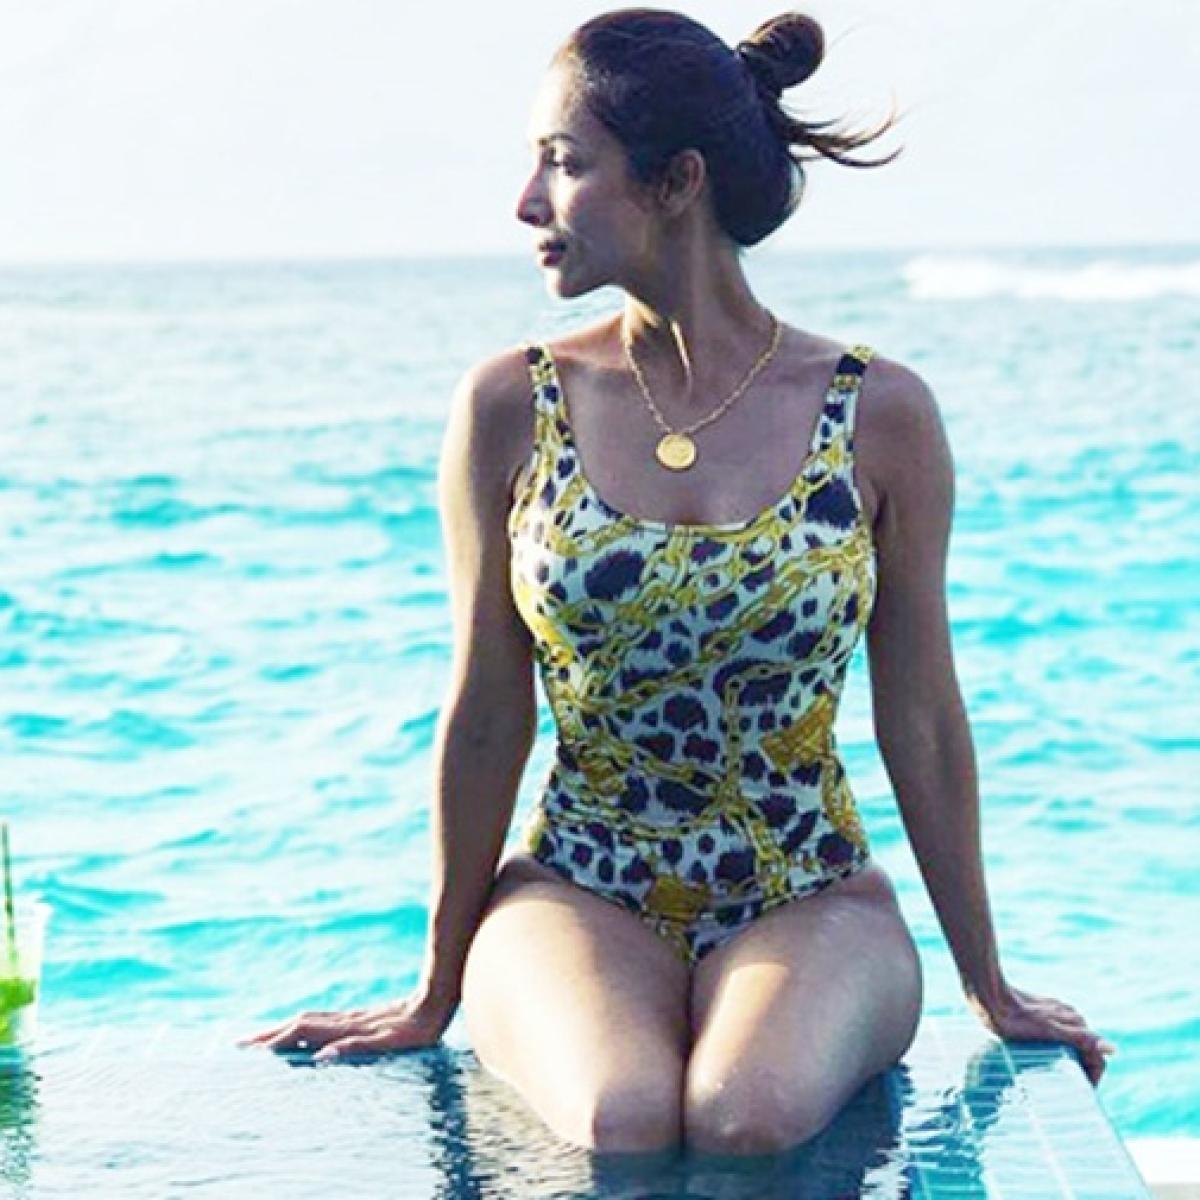 Malaika Arora flaunts her curves in a printed monokini